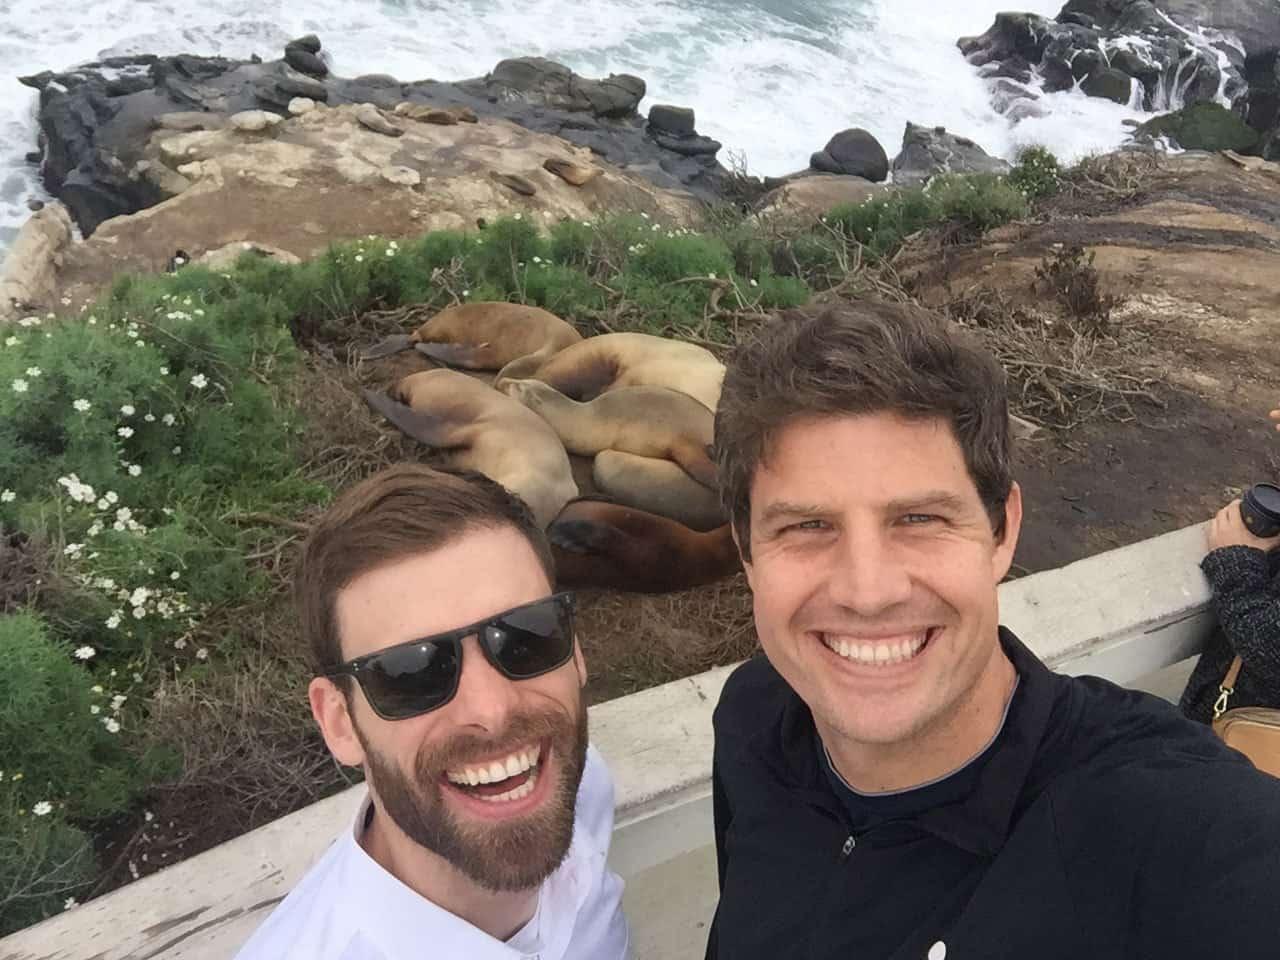 la jolla sea saves, la jolla seals, things to do in san diego, best san diego hikes, coastal hike, california beach hikes, sea lion hikes, seal hikes, best of san diego, best of la jolla